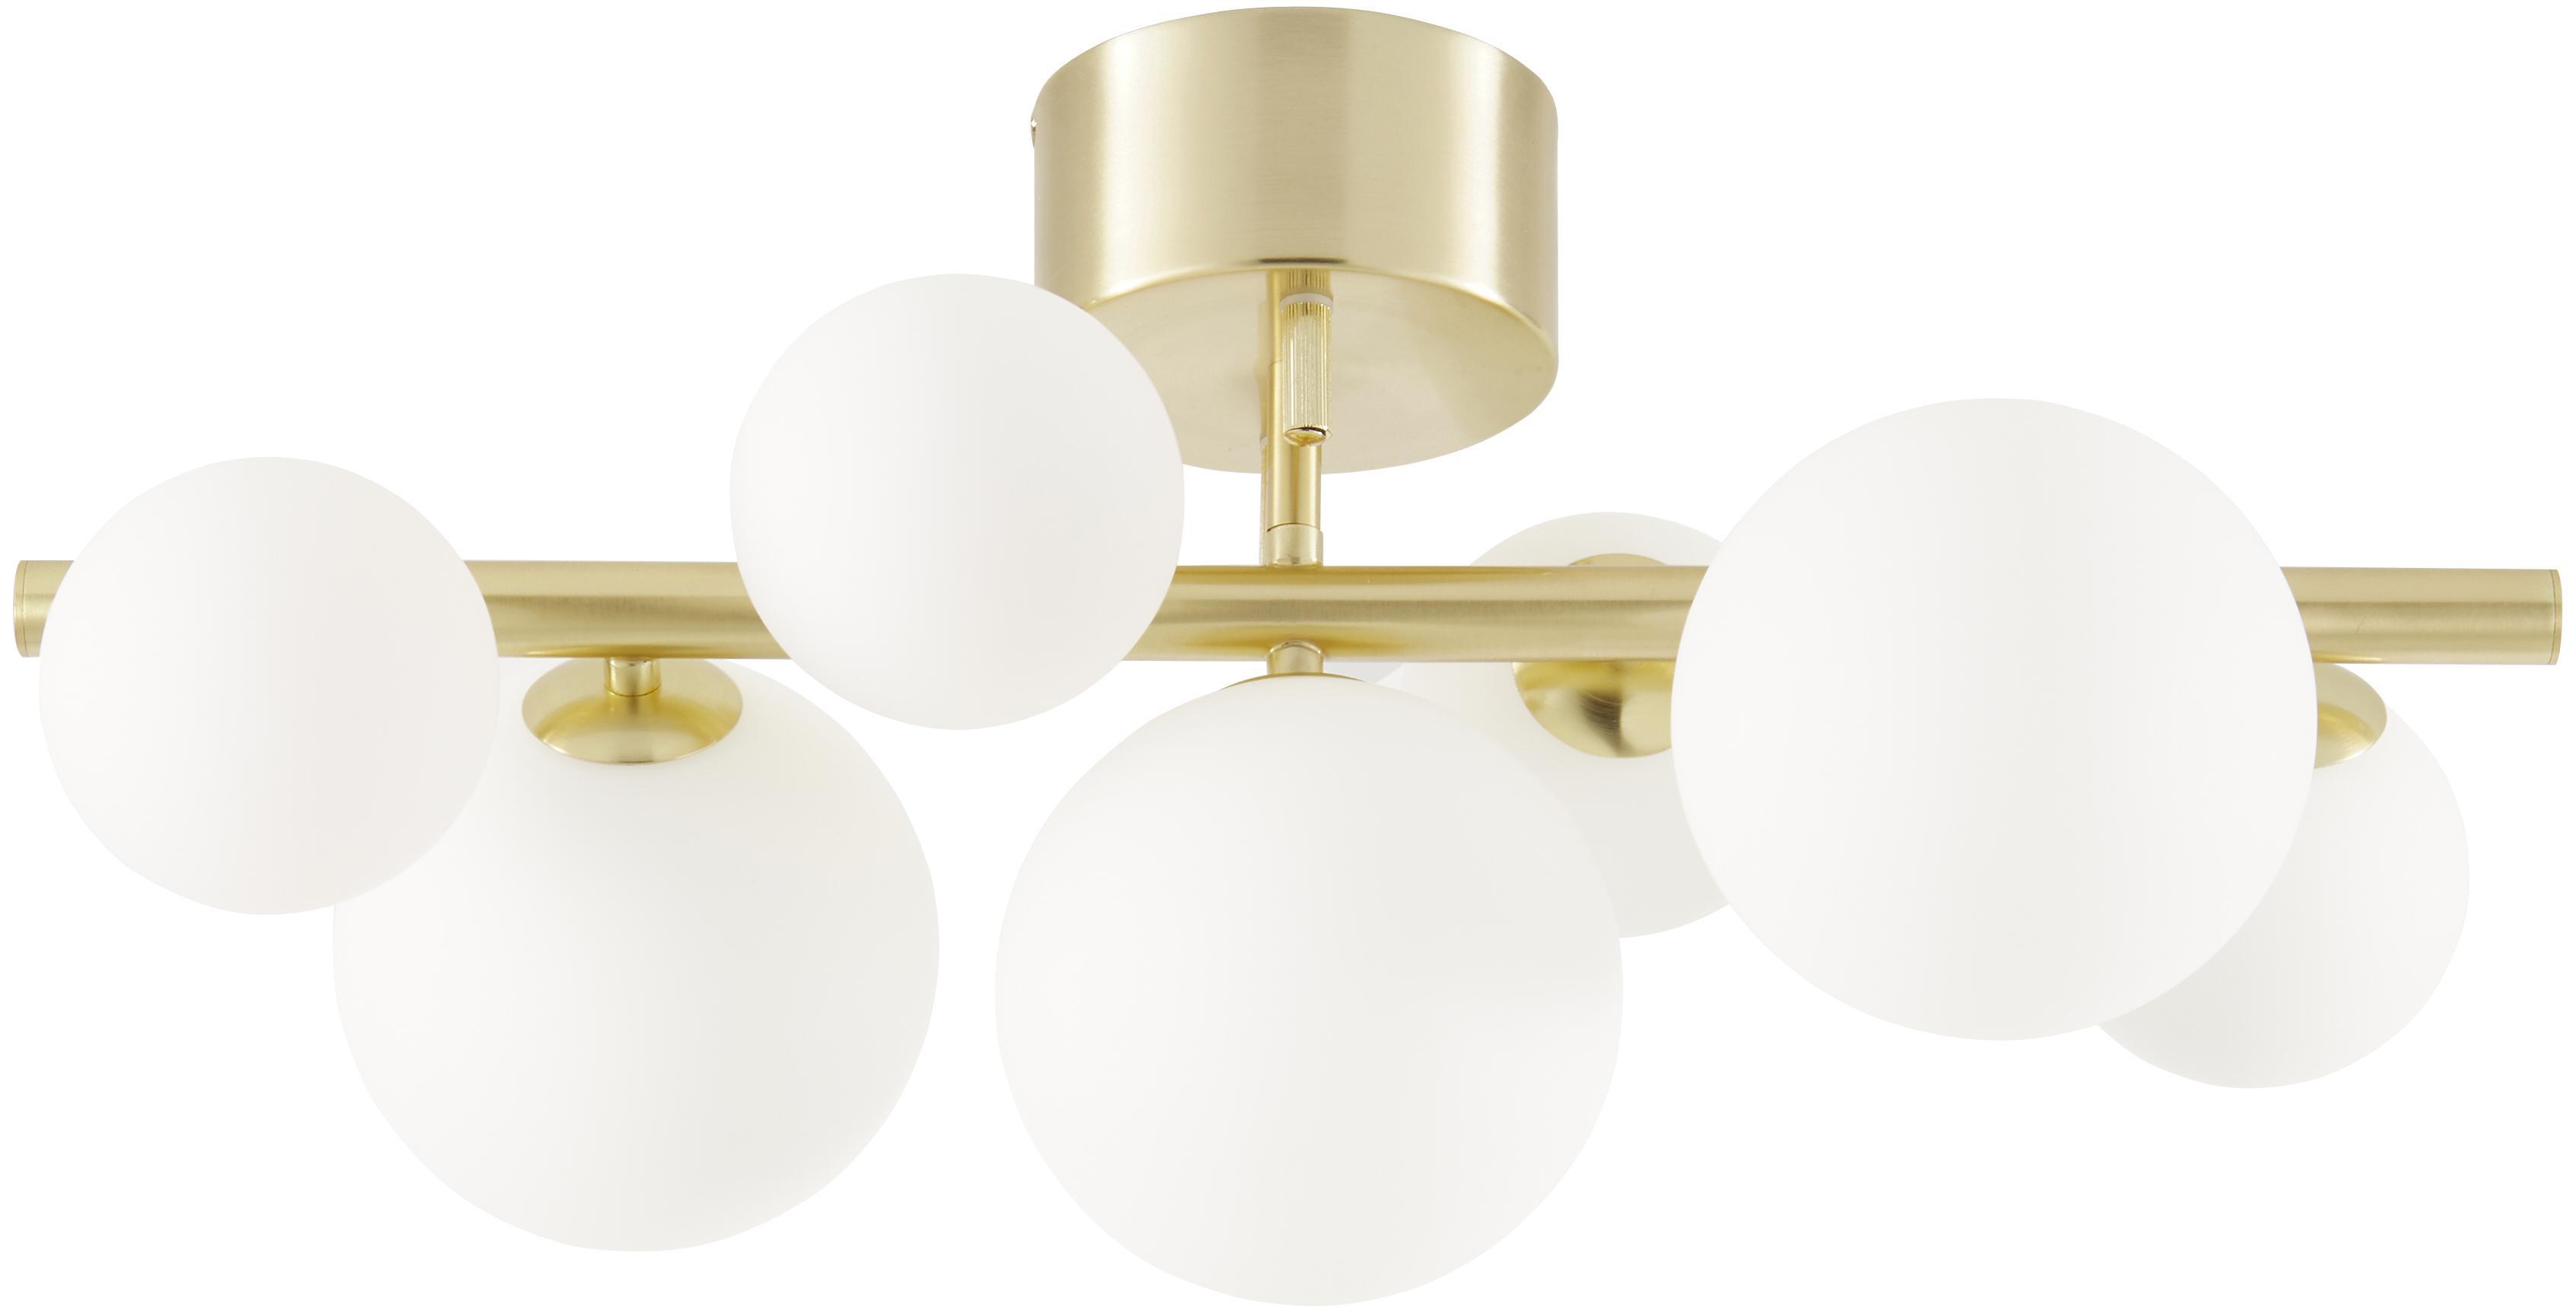 Plafonnier en métal doré Molekyl, Laiton, blanc opalescent